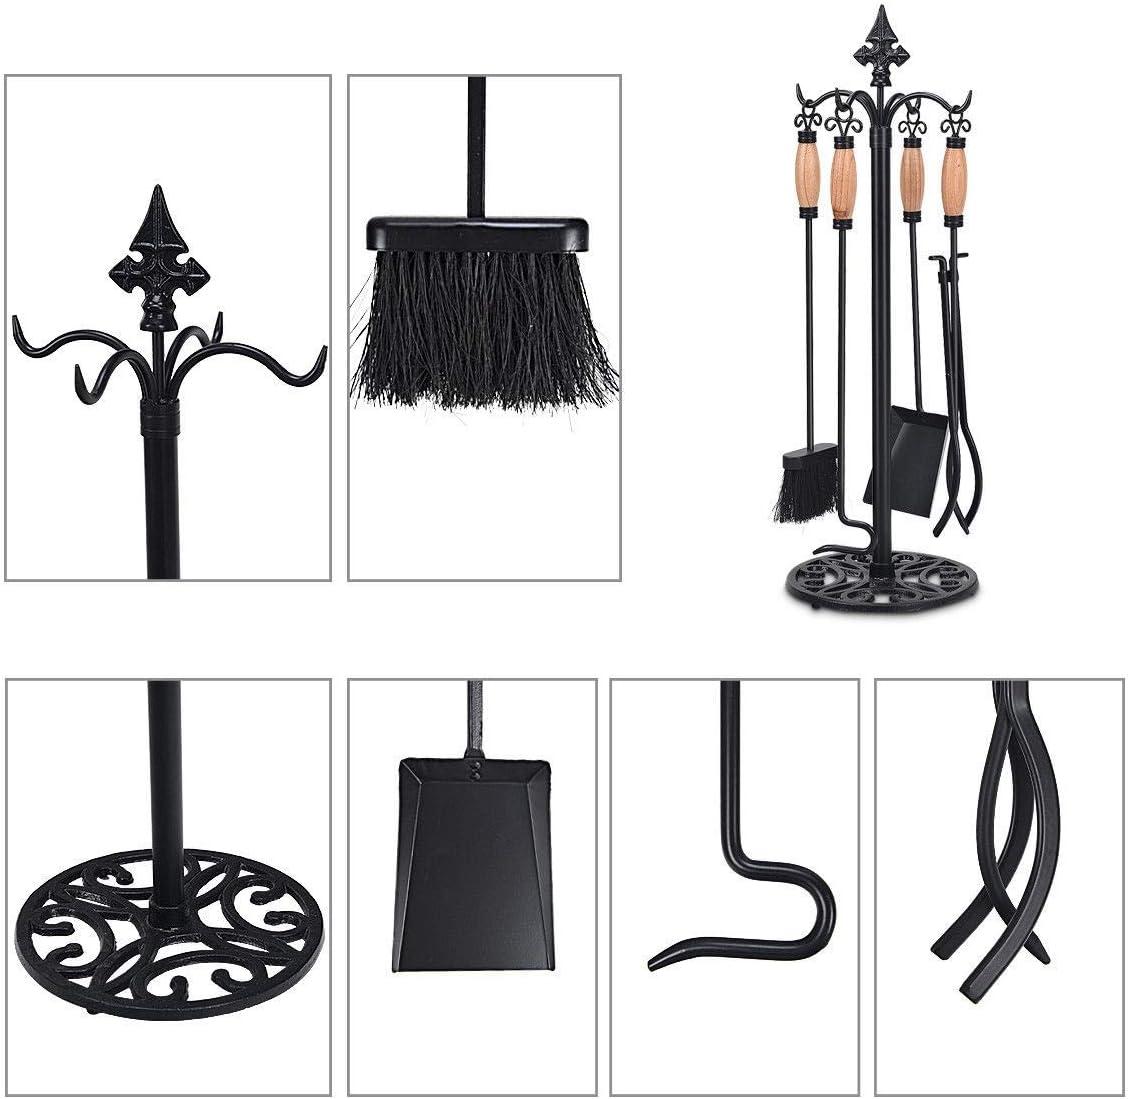 simplyUSAhello 5 Pieces Fireplace Iron Tools Set